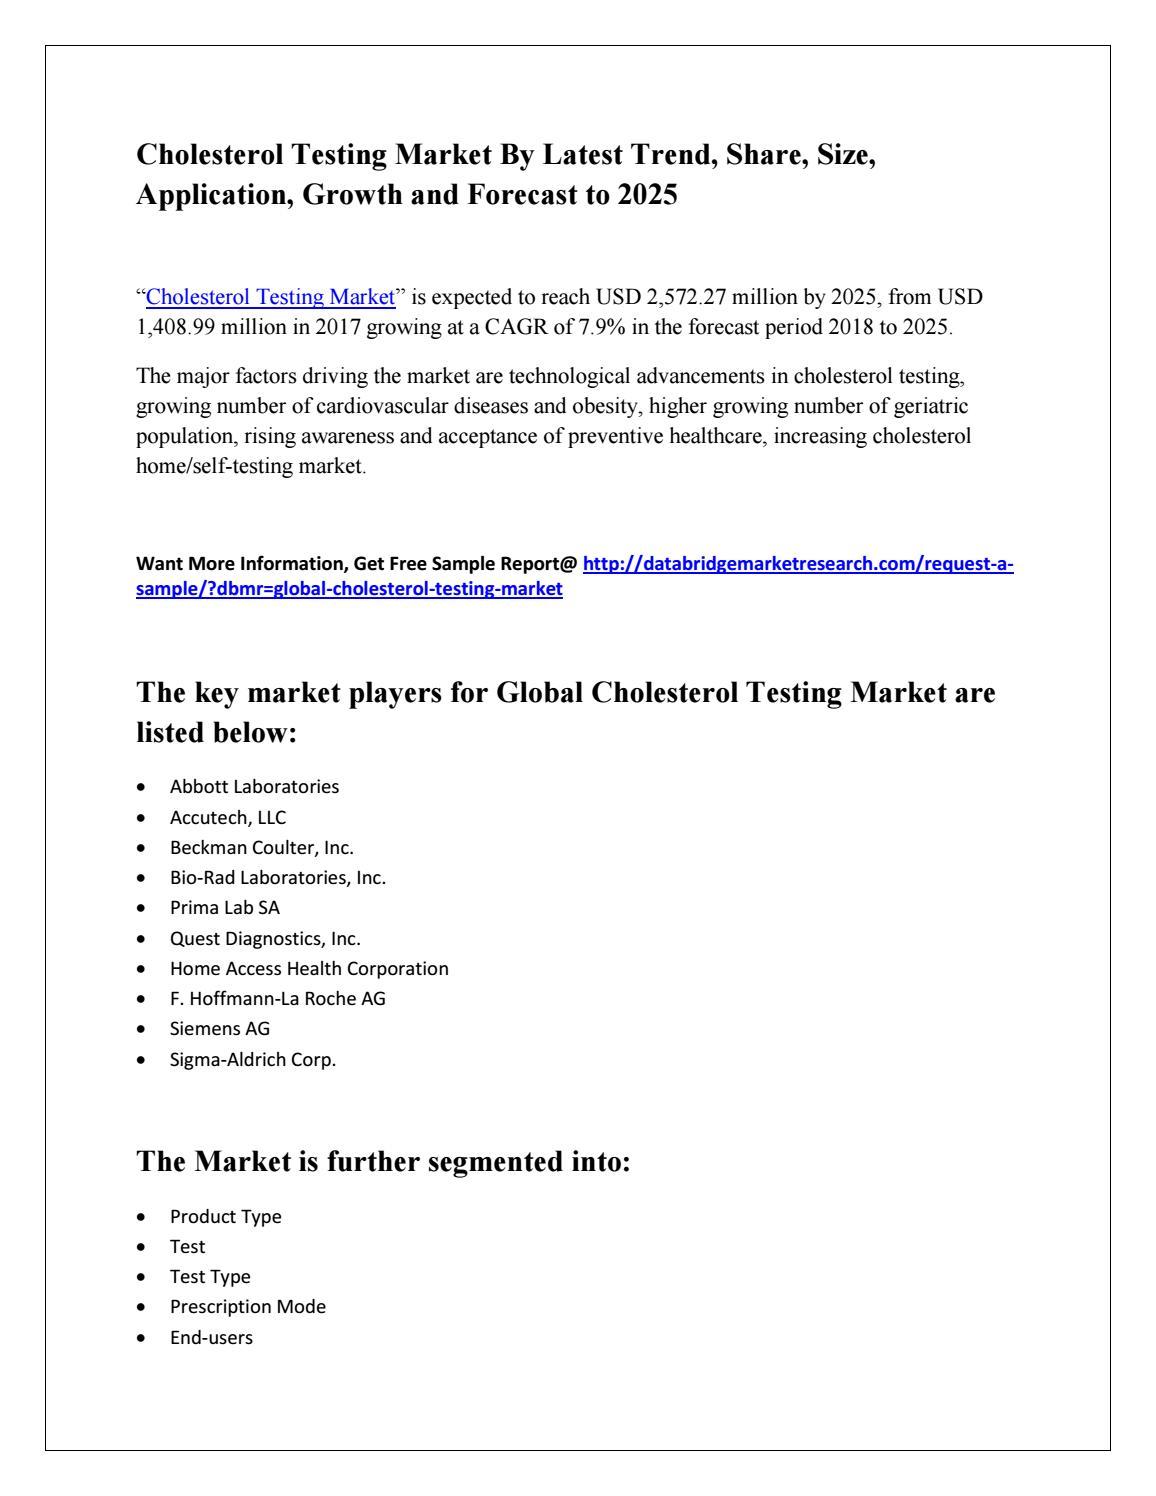 Cholesterol testing market pdf by kamran khan - issuu